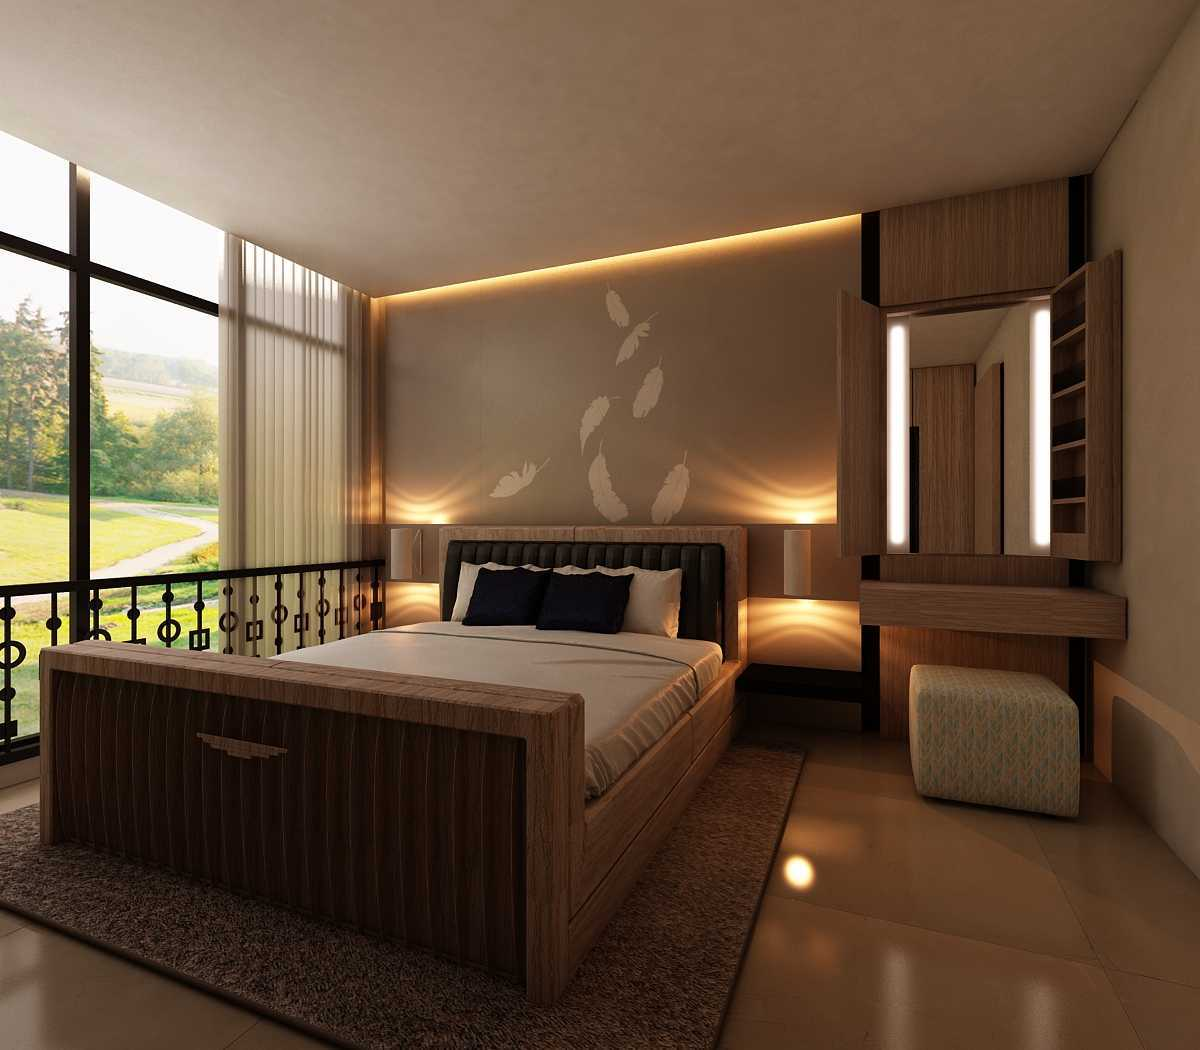 Meili Darmasetiawan Summerbliss Residence Lippo Cikarang Bekasi Lippo Cikarang Bekasi 3D-Kamar-Tidur-Utama-Vw Modern 13791